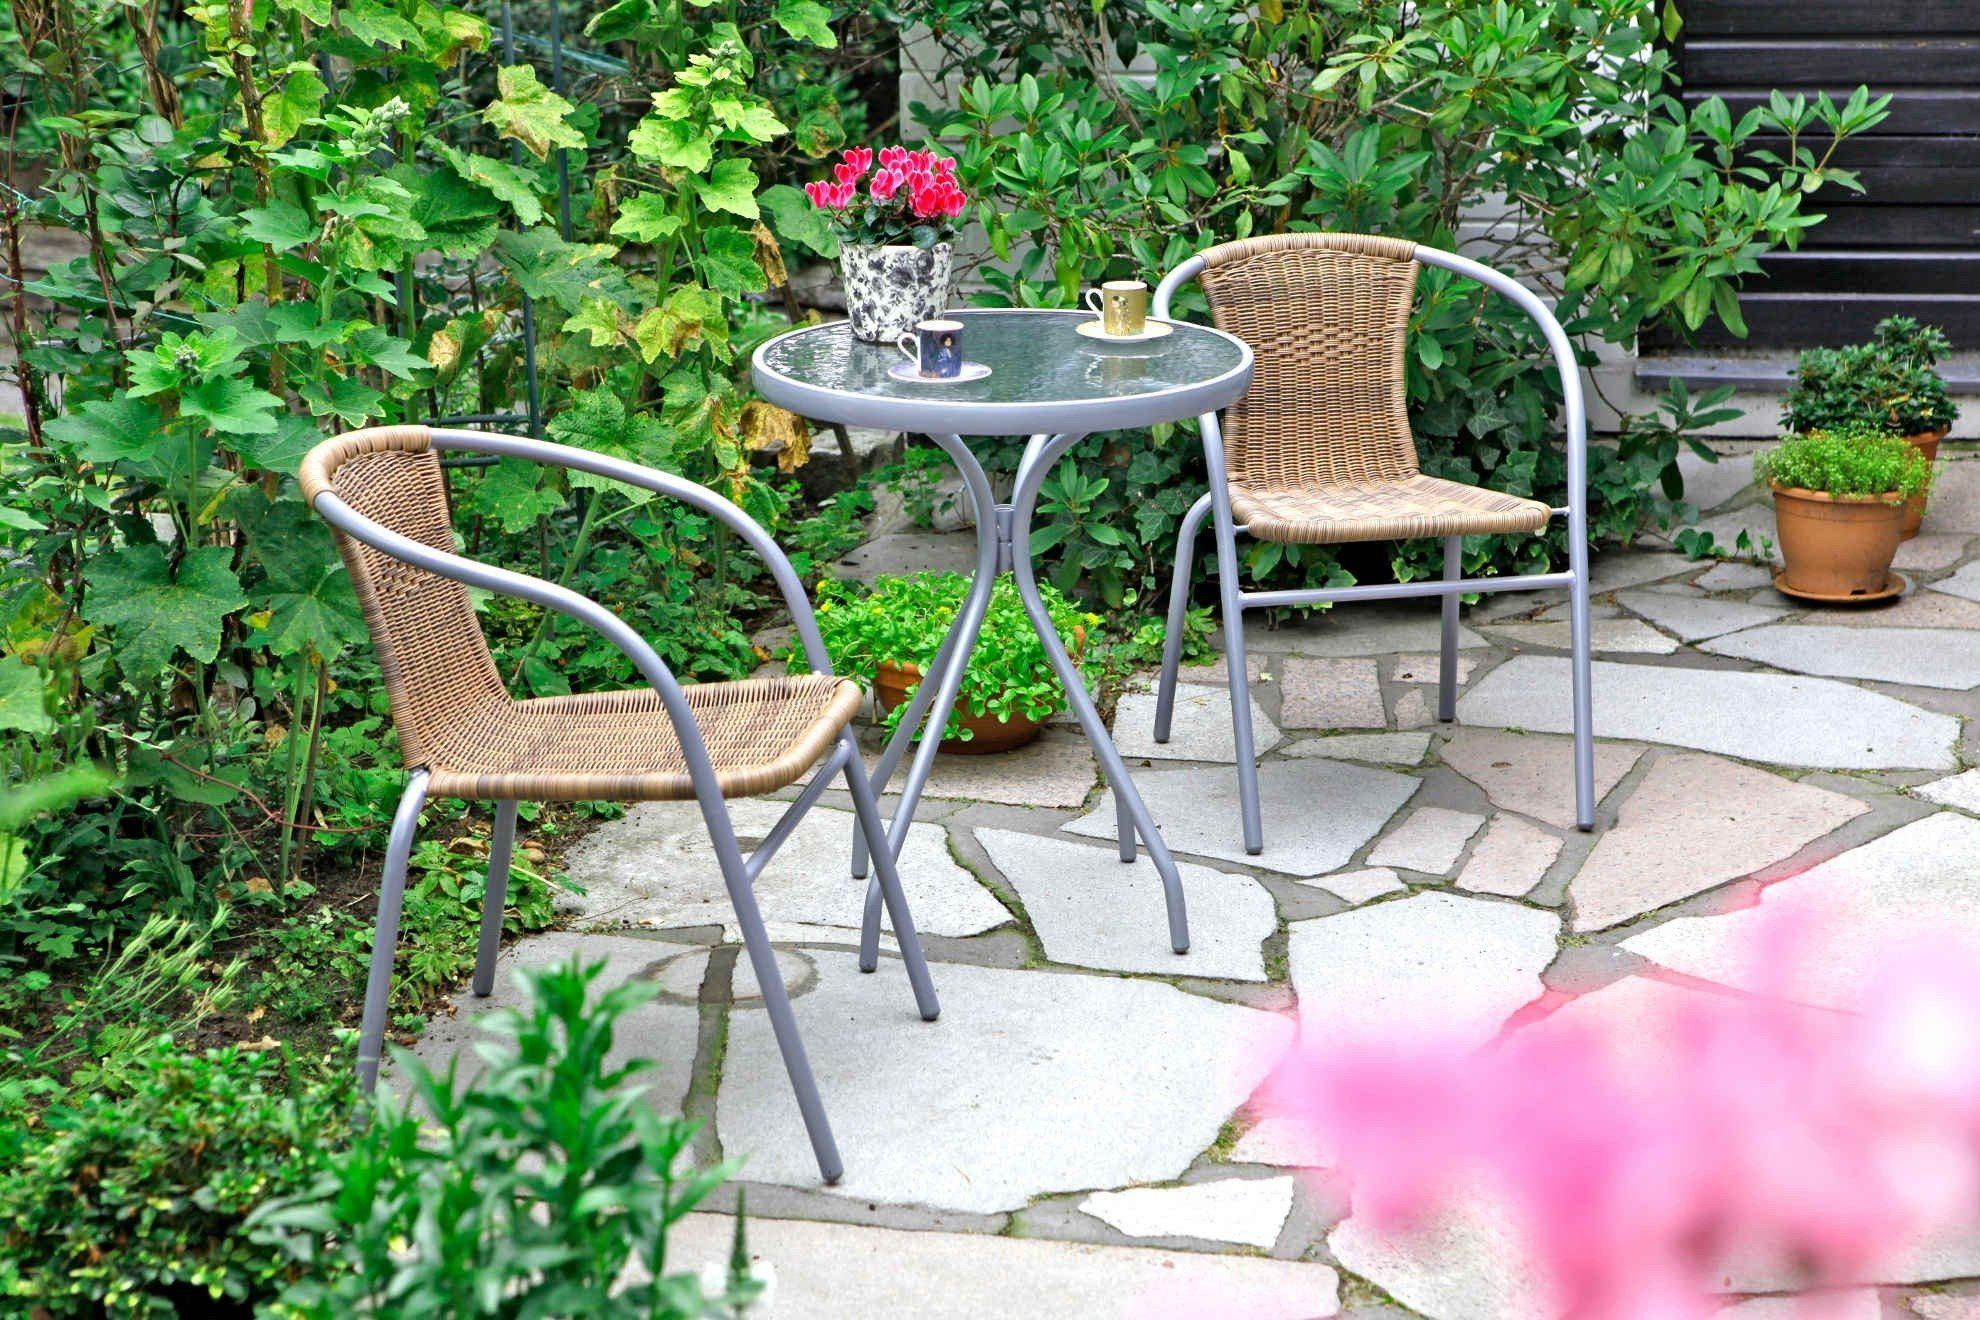 3-tgl. Gartenmöbelset »Alassio«, 2 Sessel, TischØ60 cm, Polyrattan, Stahl